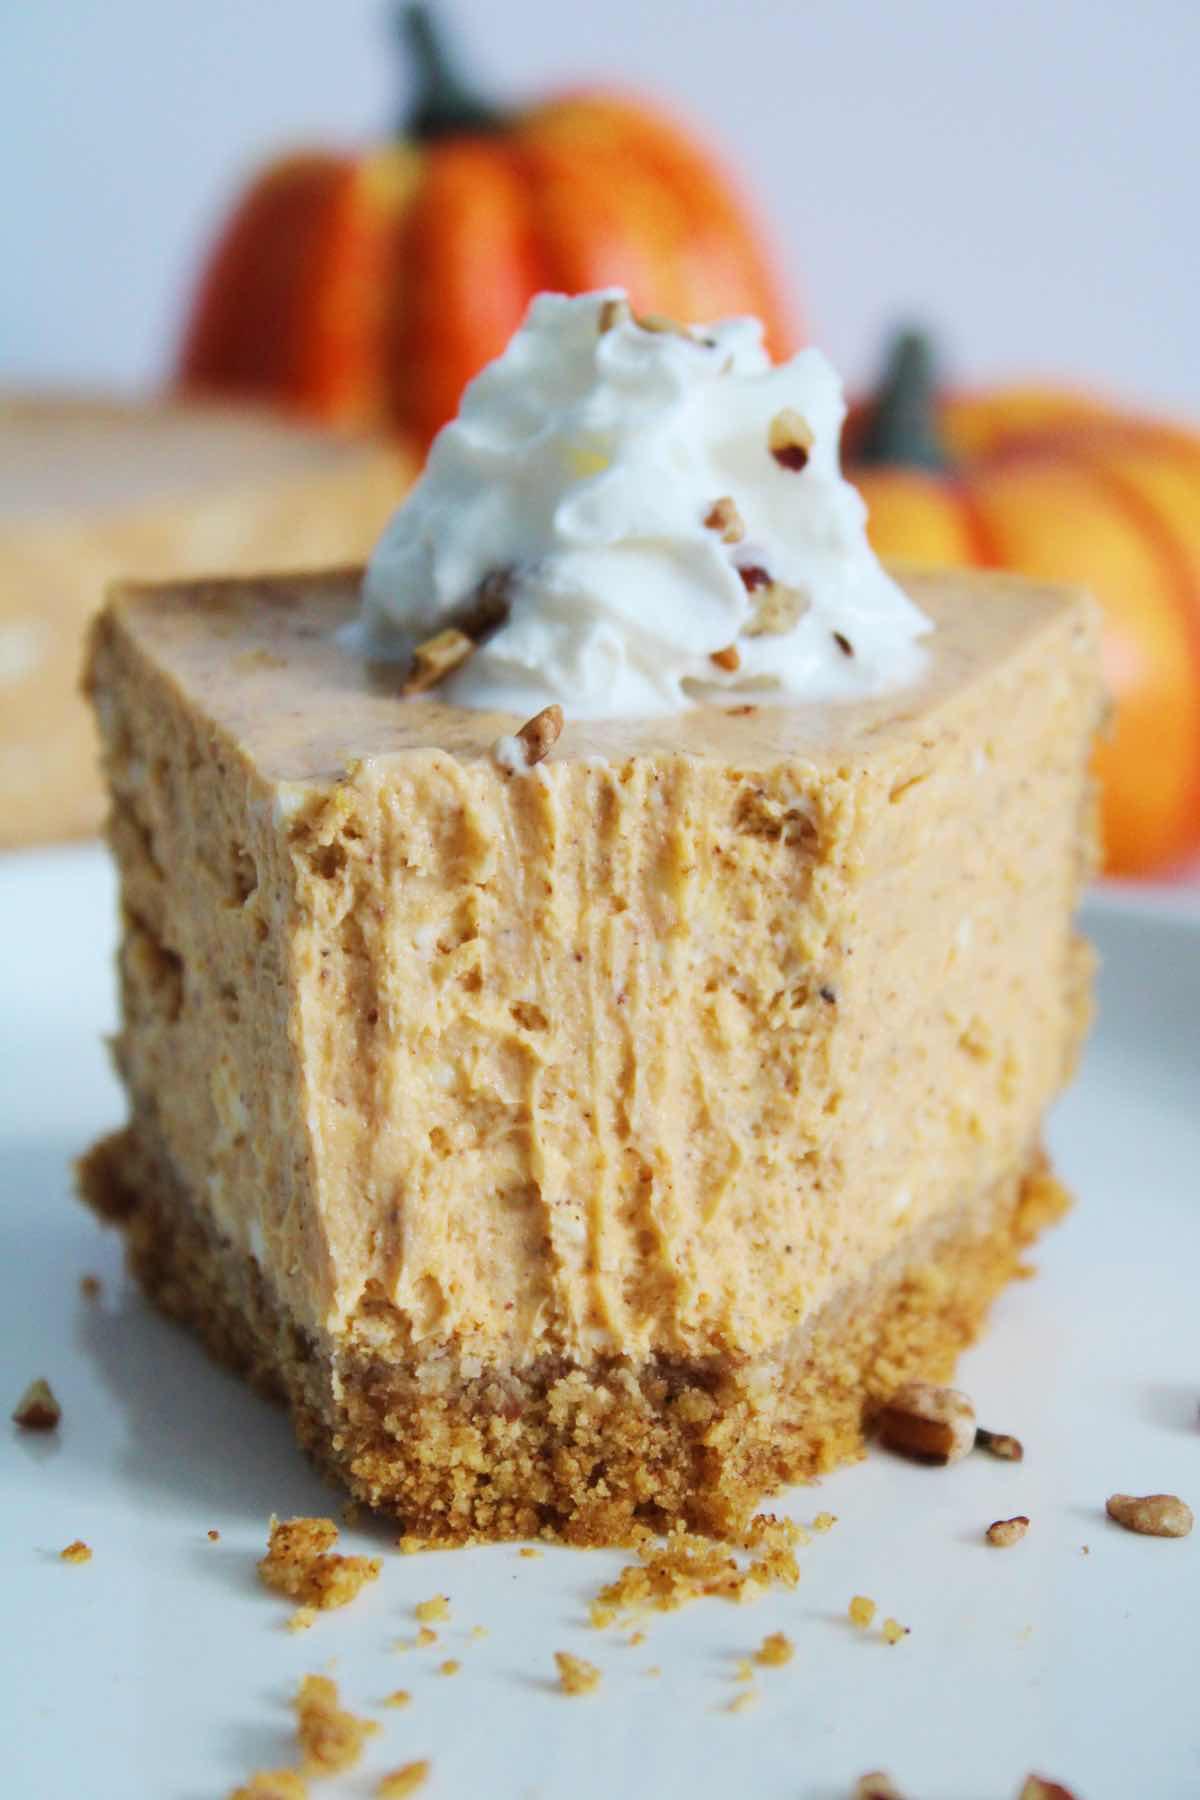 Creamy pumpkin cheesecake made from scratch.